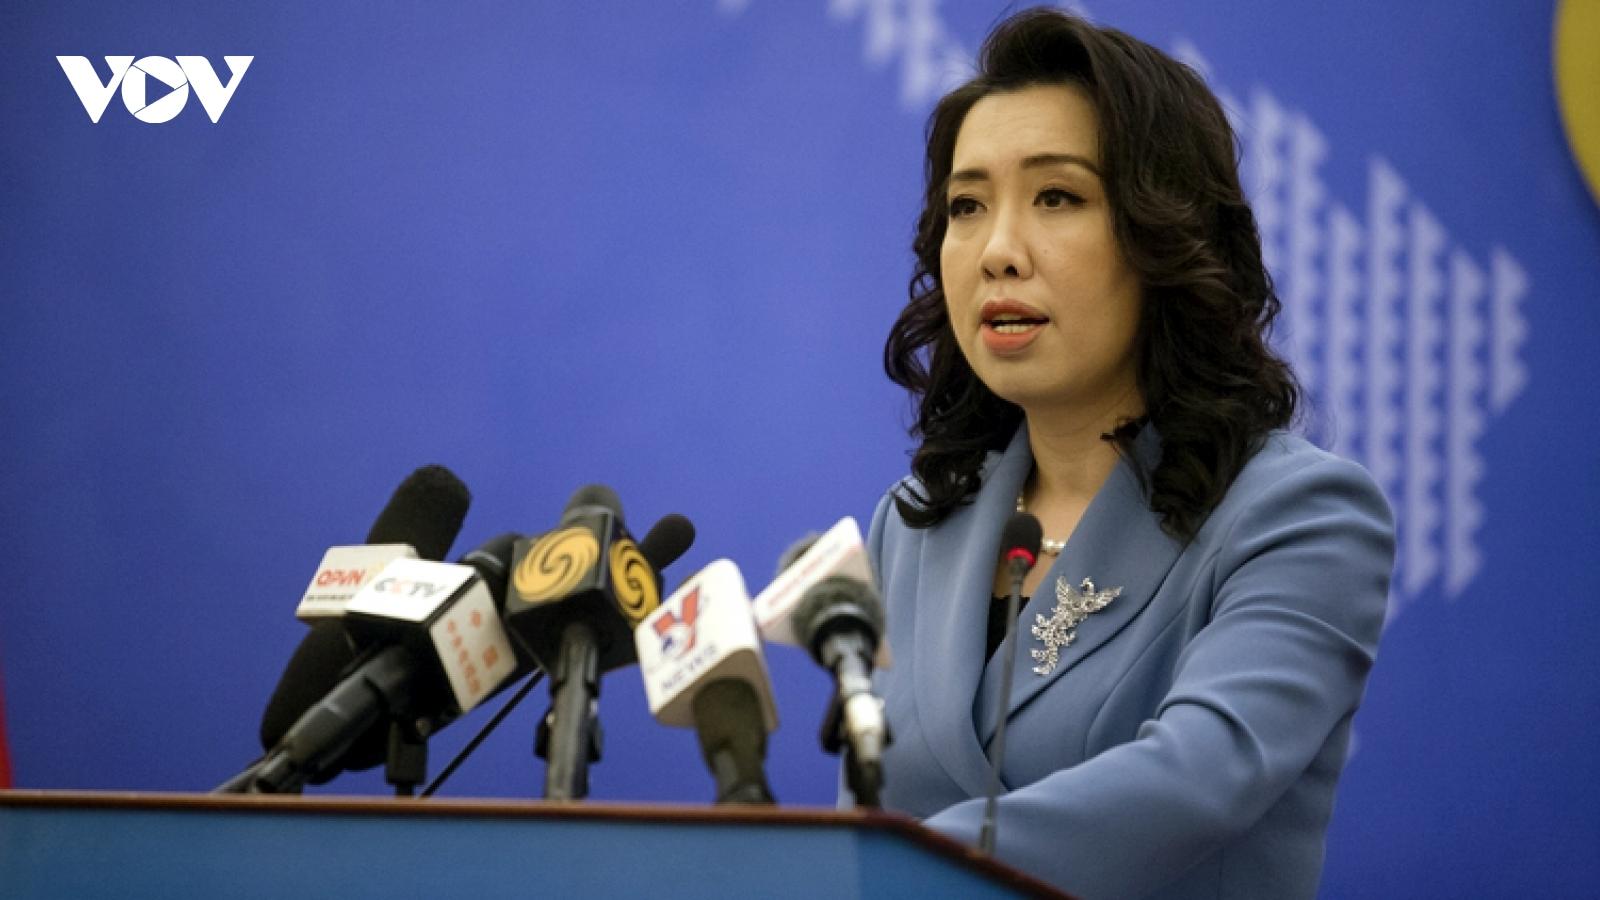 Vietnam slams Taiwan's live fire drills on Spratly islands